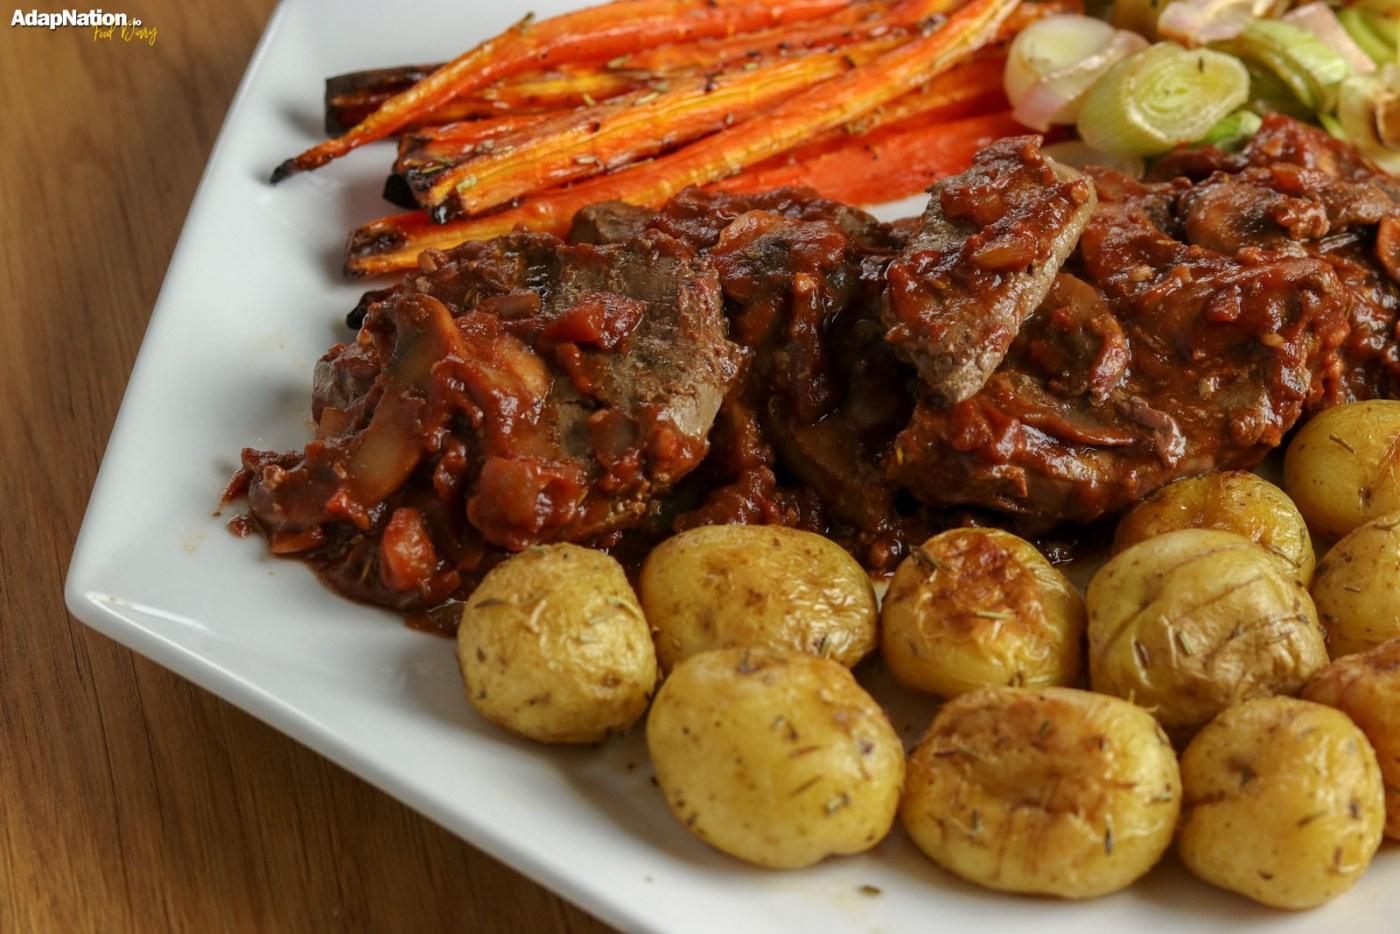 Lambs Liver in Tomato & Mushroom Sauce, with Sweet & Crispy Veg